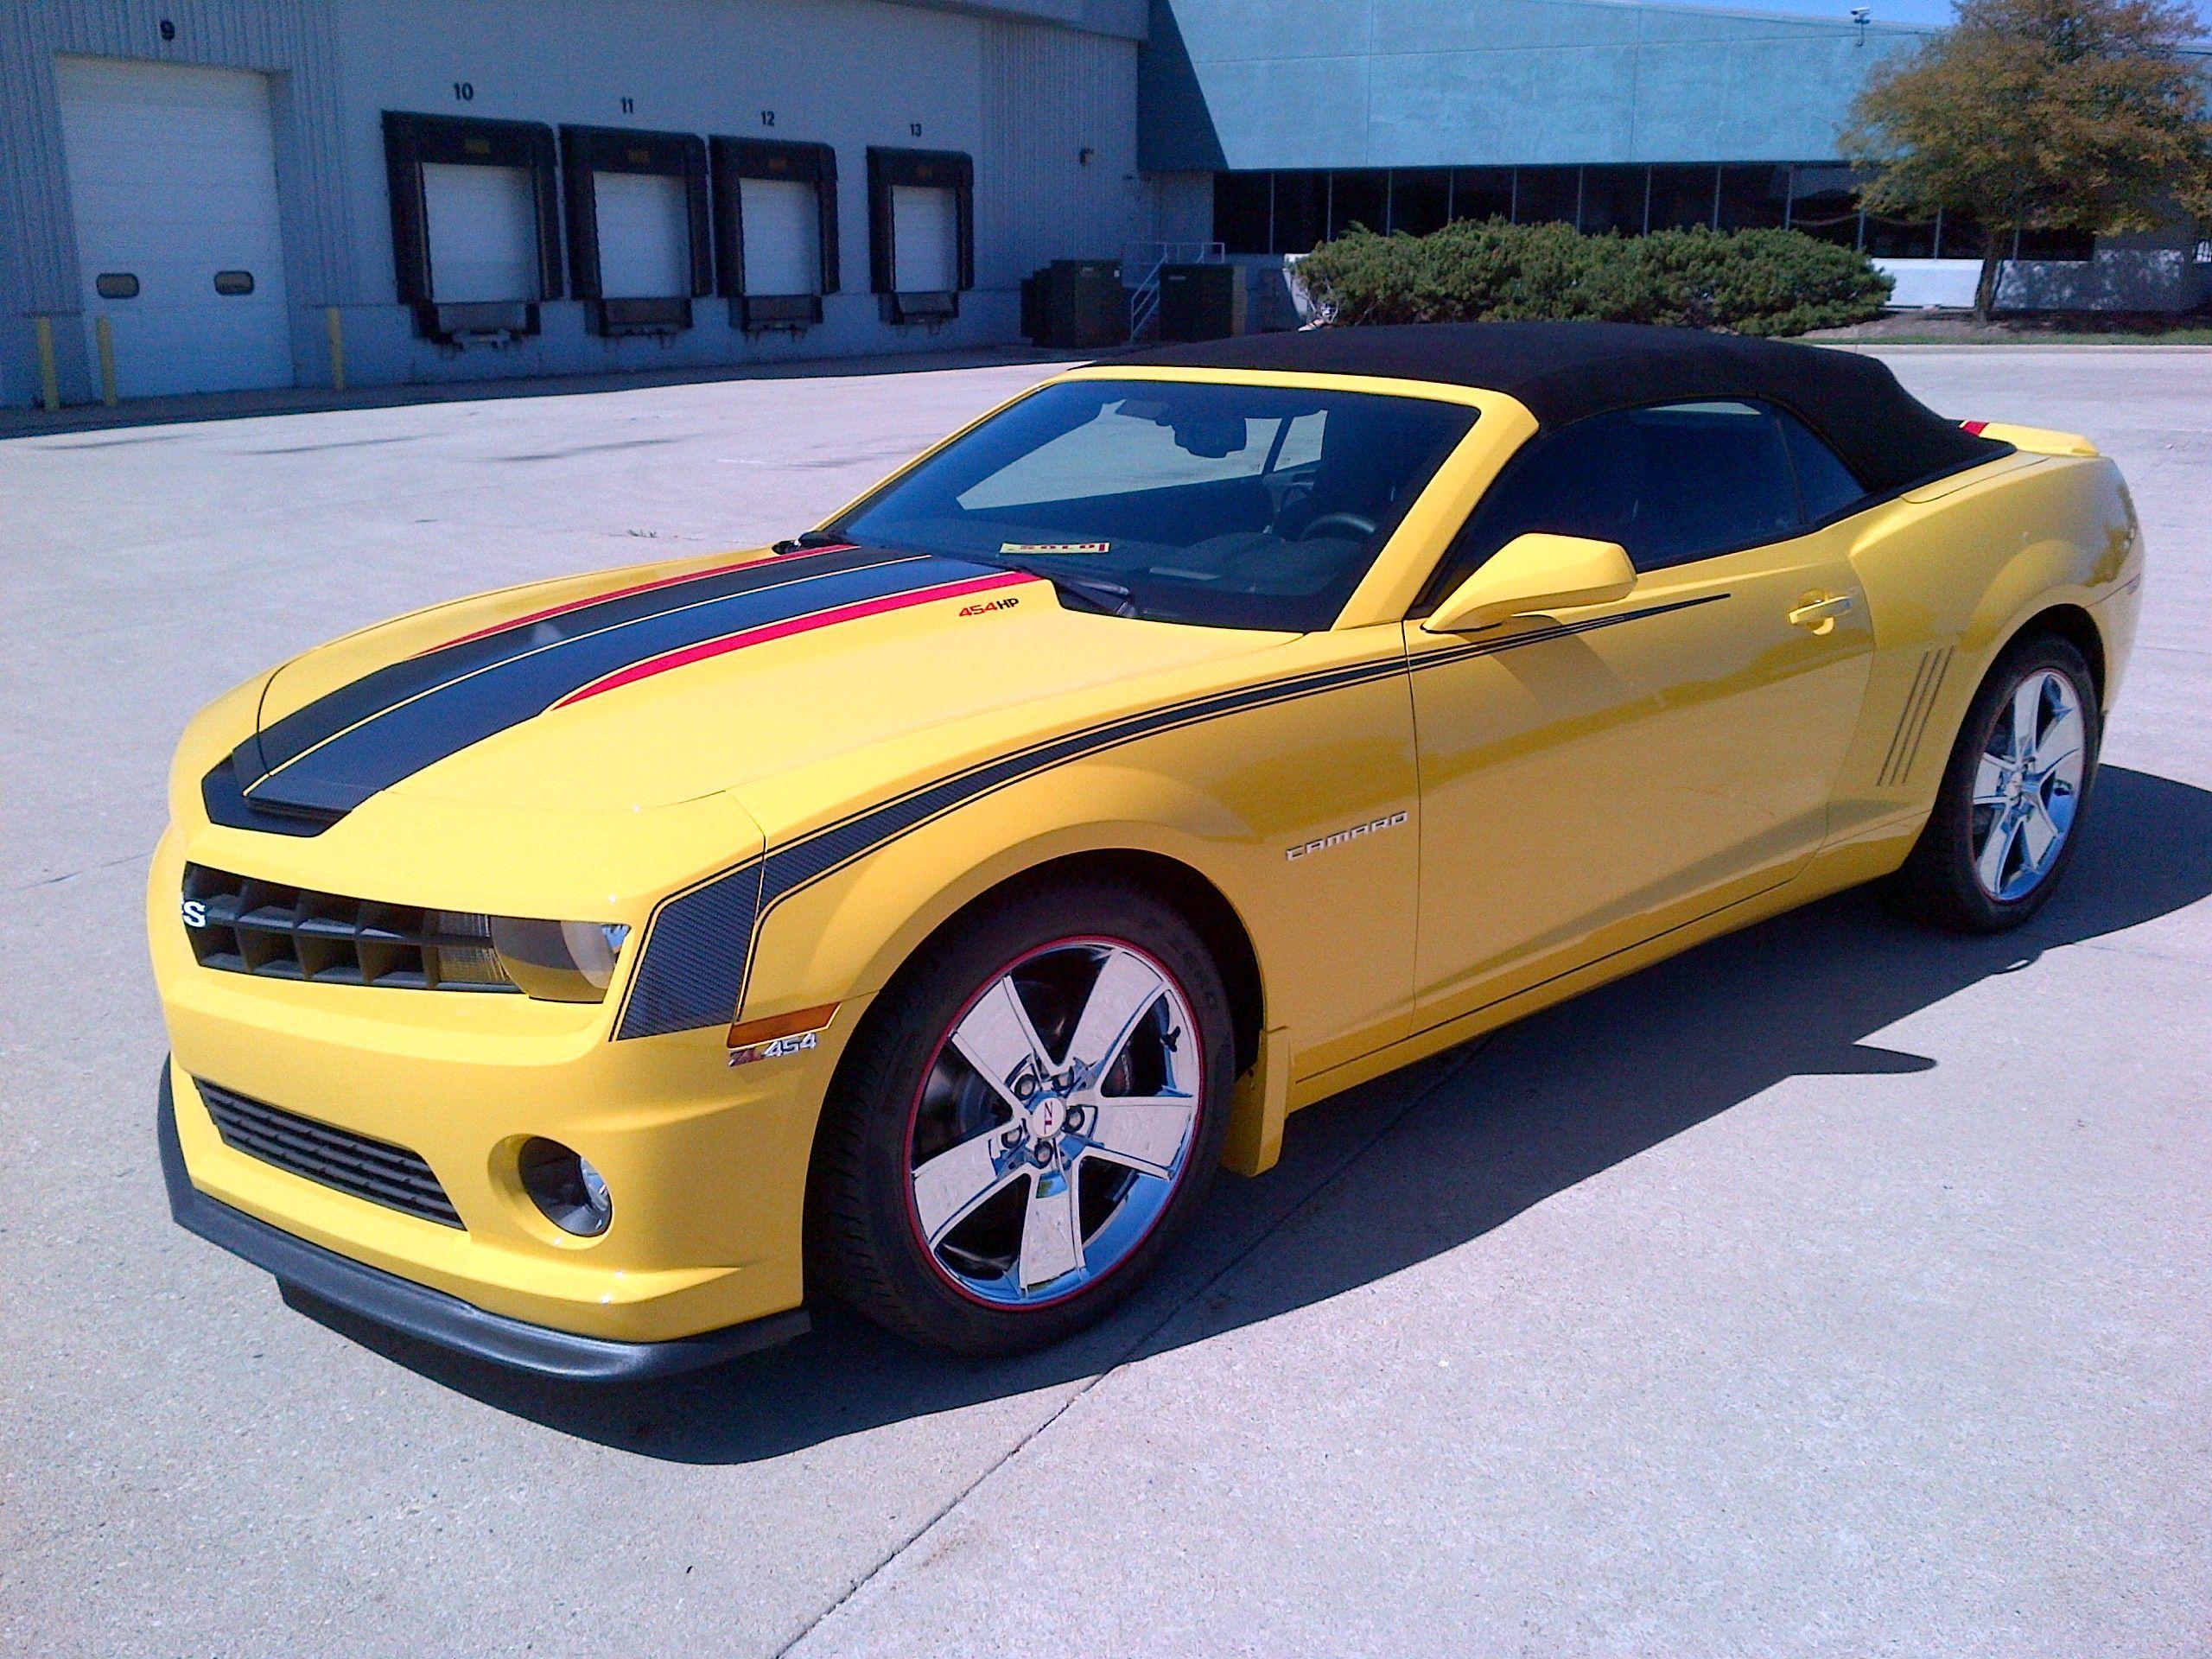 2012 Slp Zl454 Camaro Yellow With Custom Stripes Badges